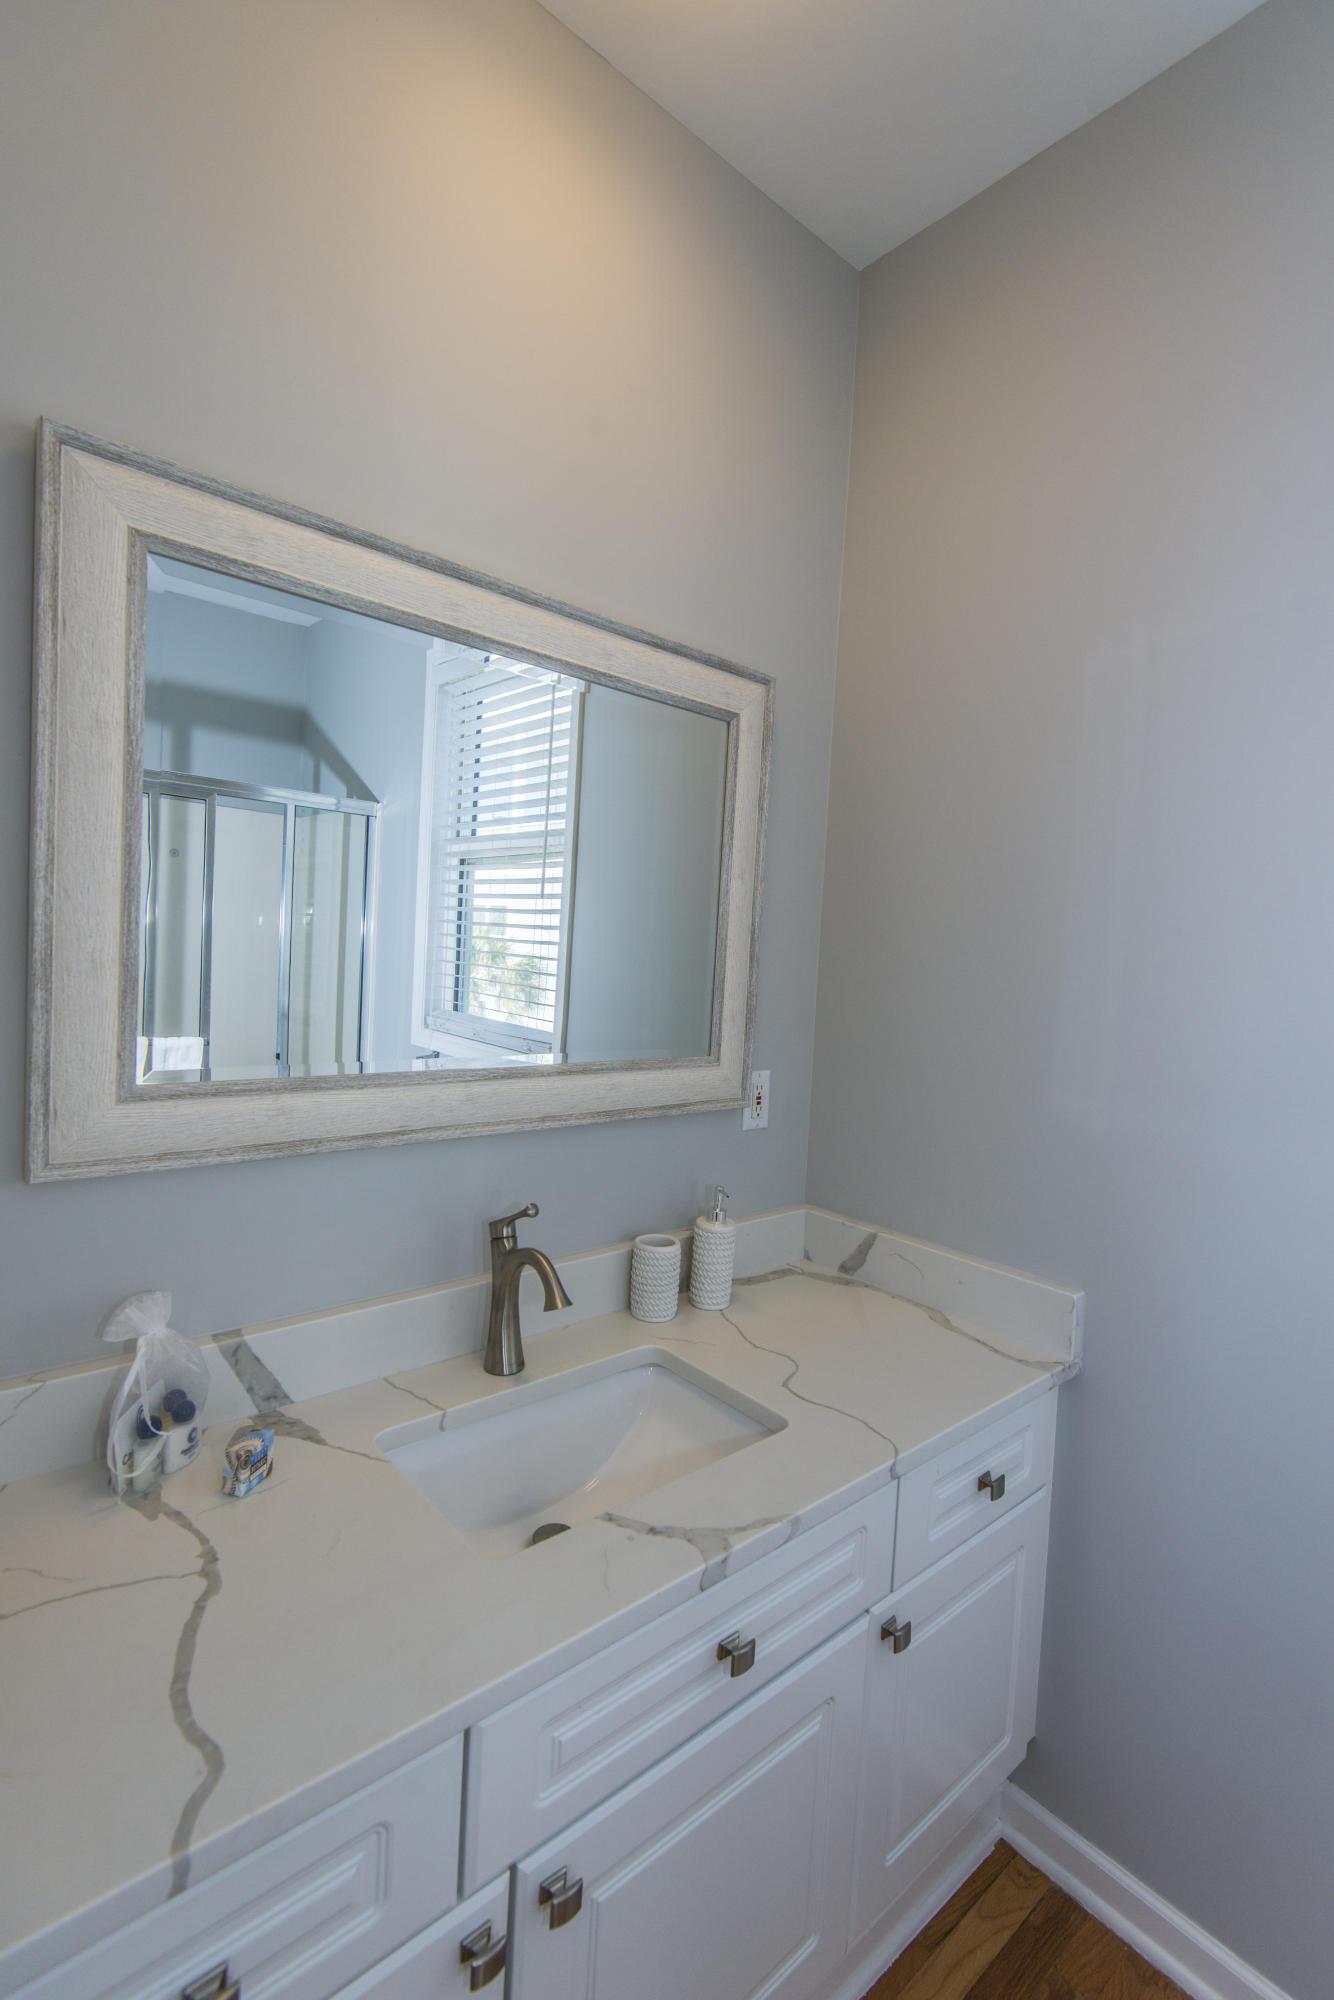 East Folly Beach Shores Homes For Sale - 2 Sumter, Folly Beach, SC - 20